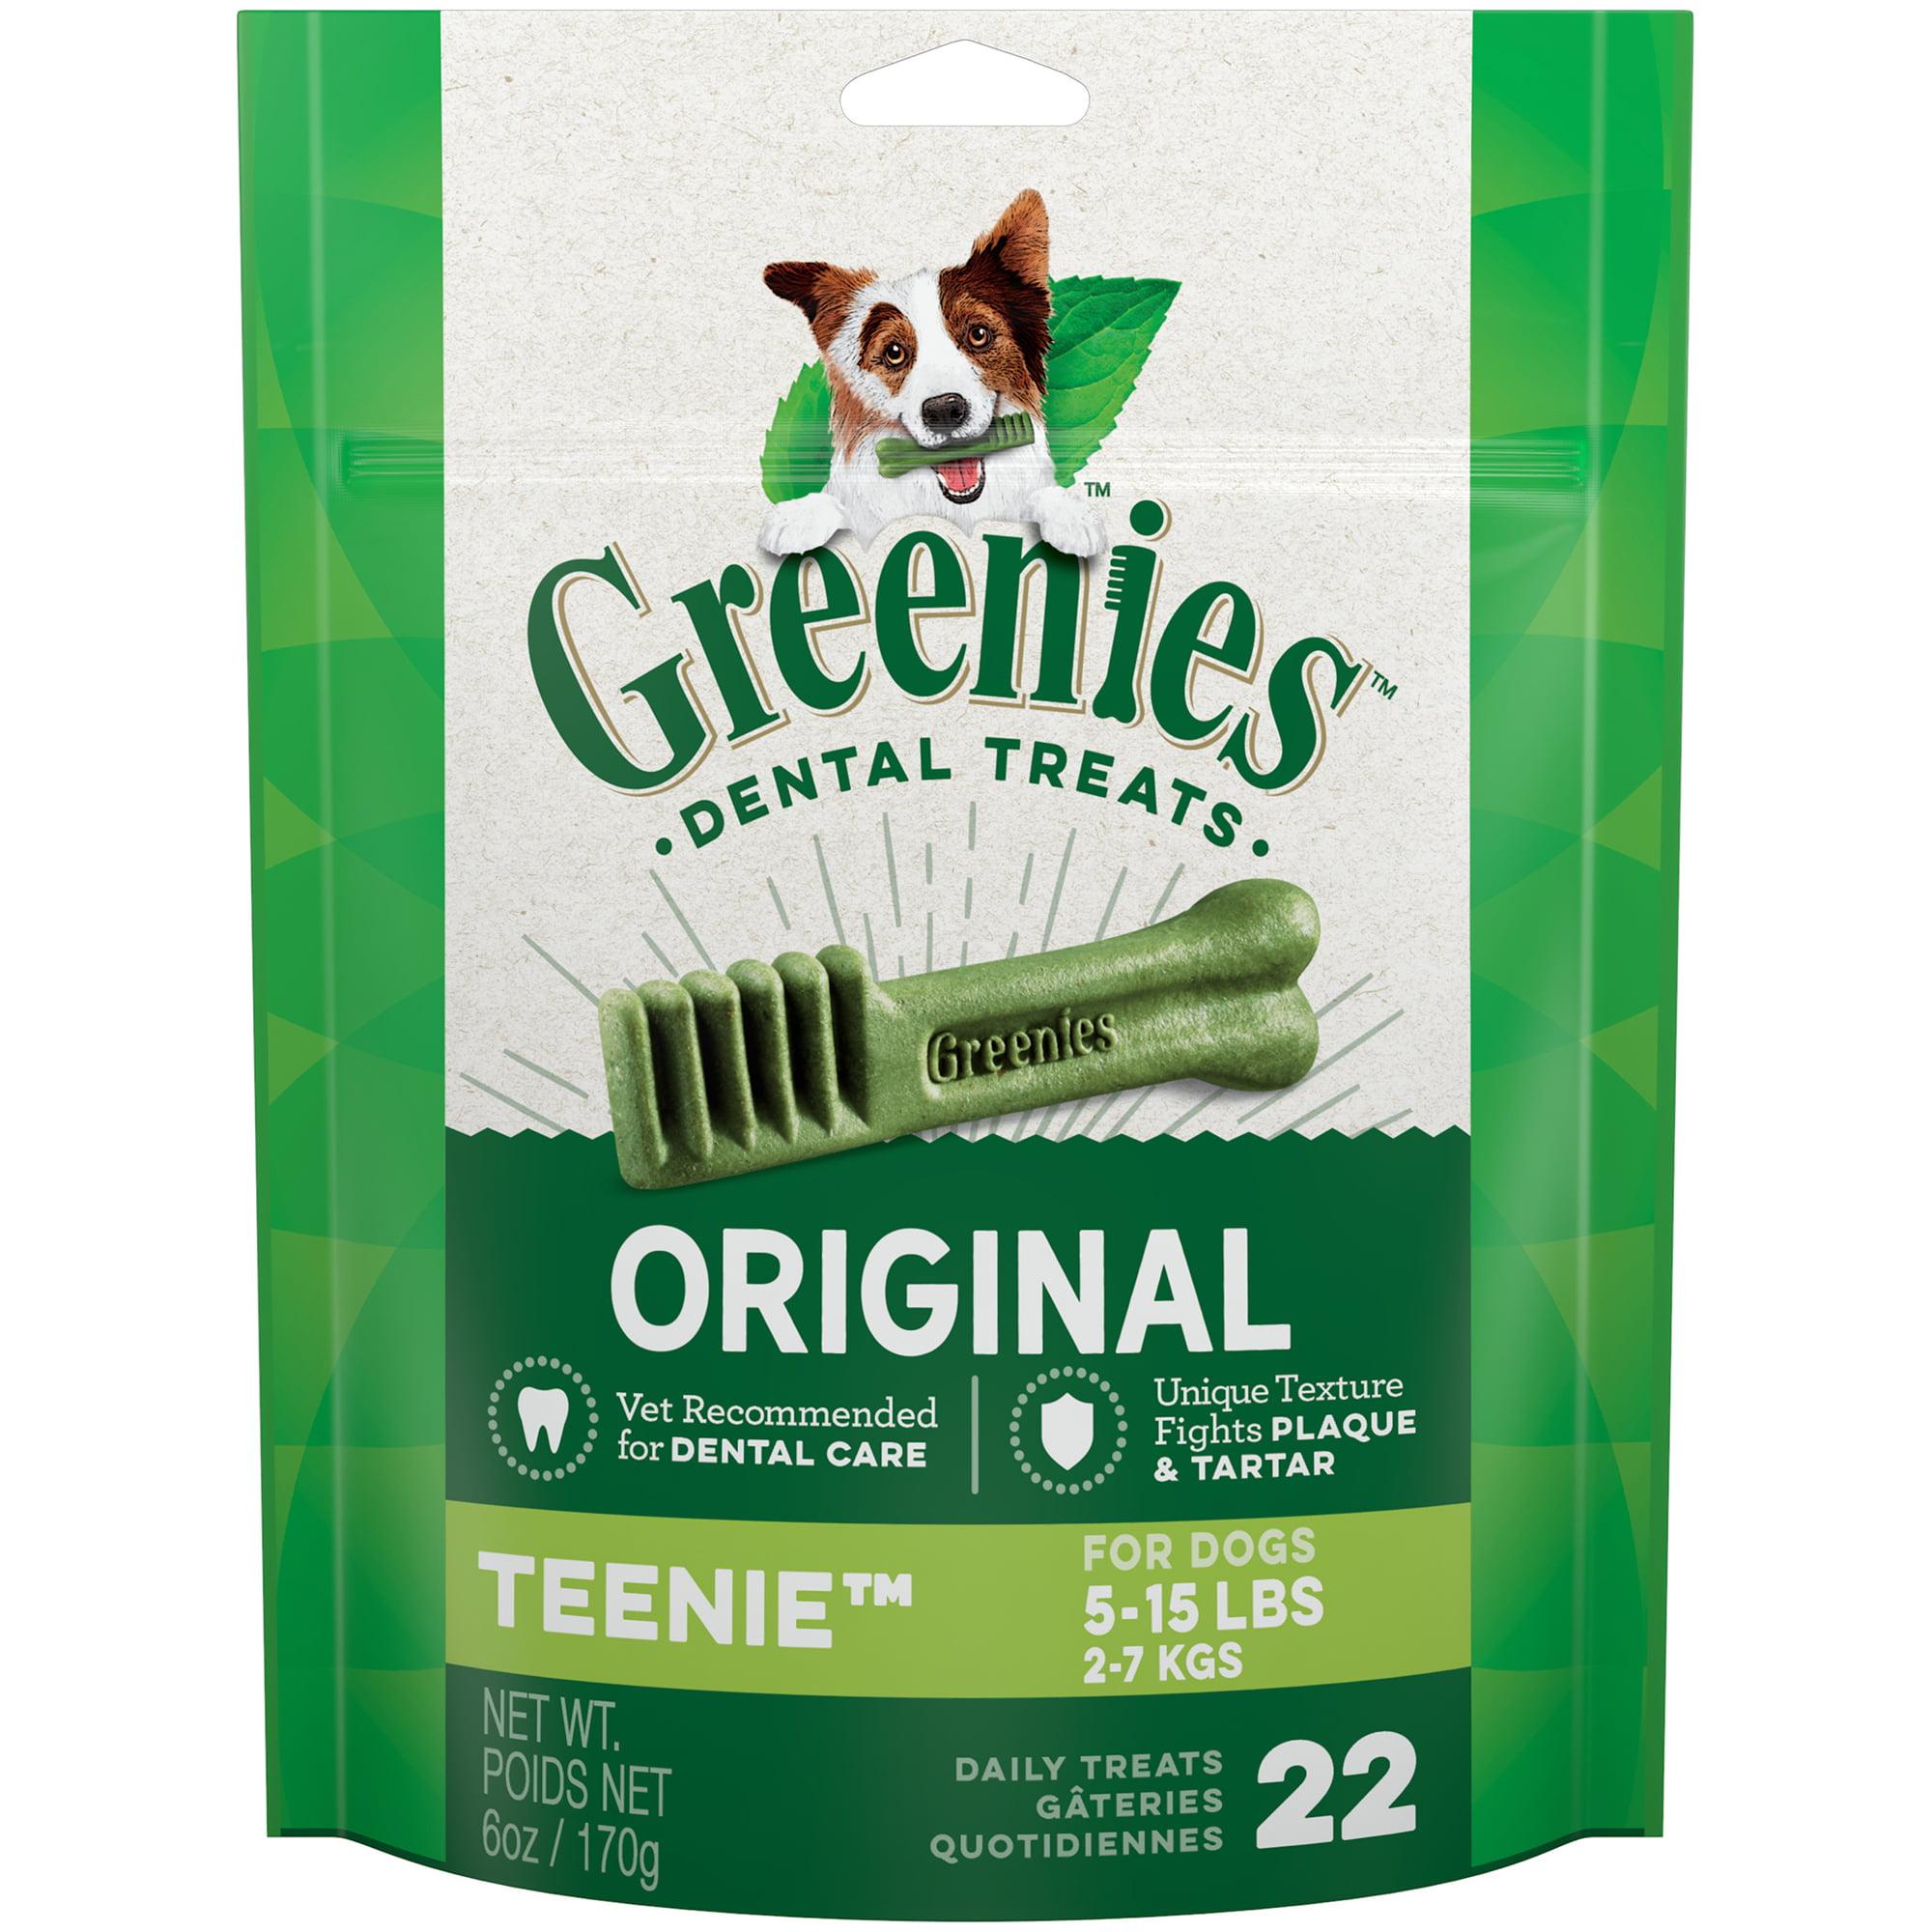 GREENIES Original TEENIE Dental Dog Treats, 6 oz. Pack (22 Treats) by Mars Petcare